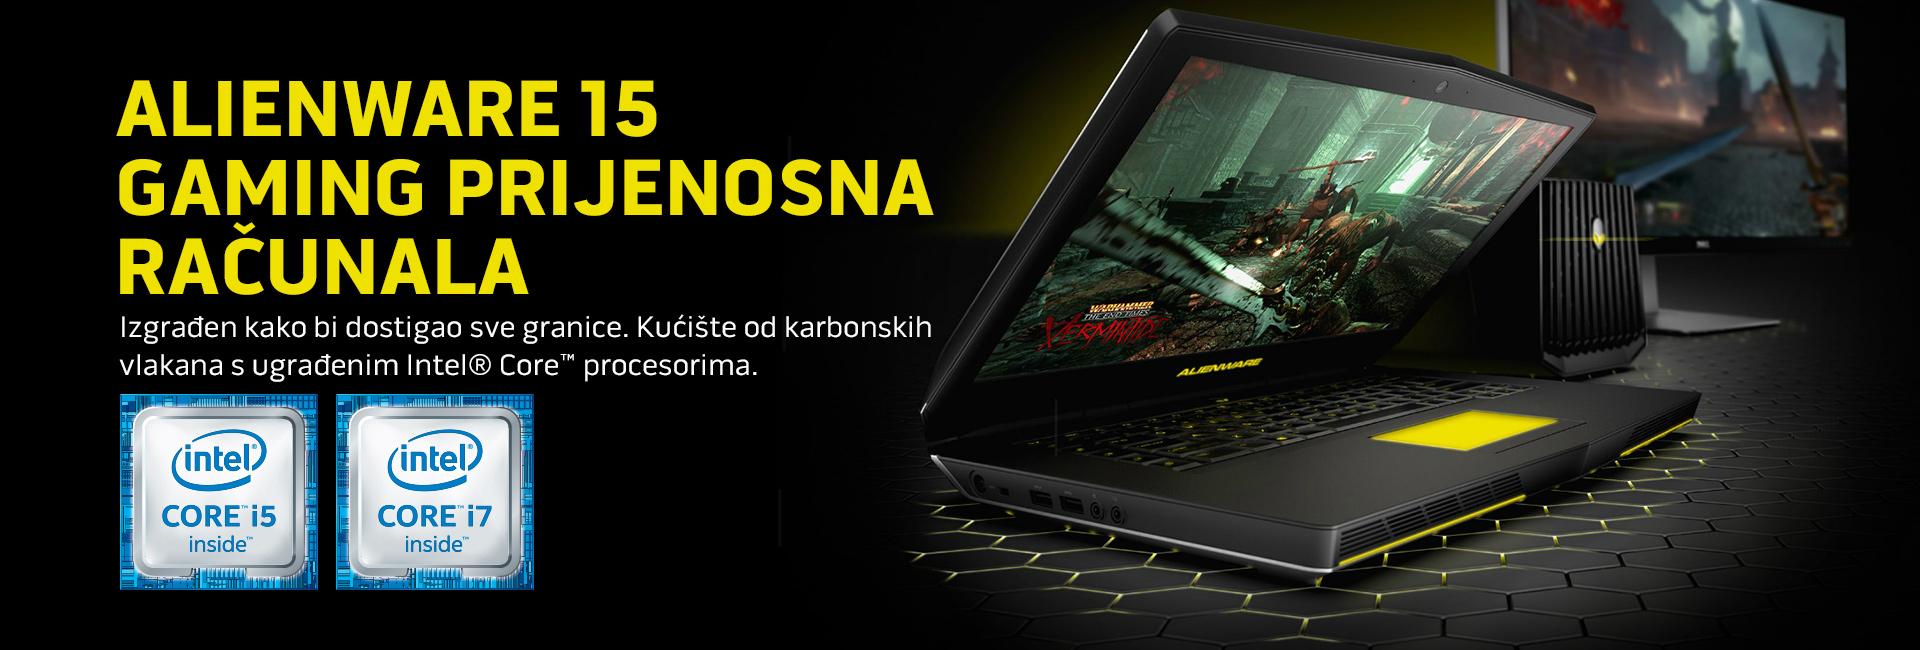 Alienware 15 gaming prijenosna računala